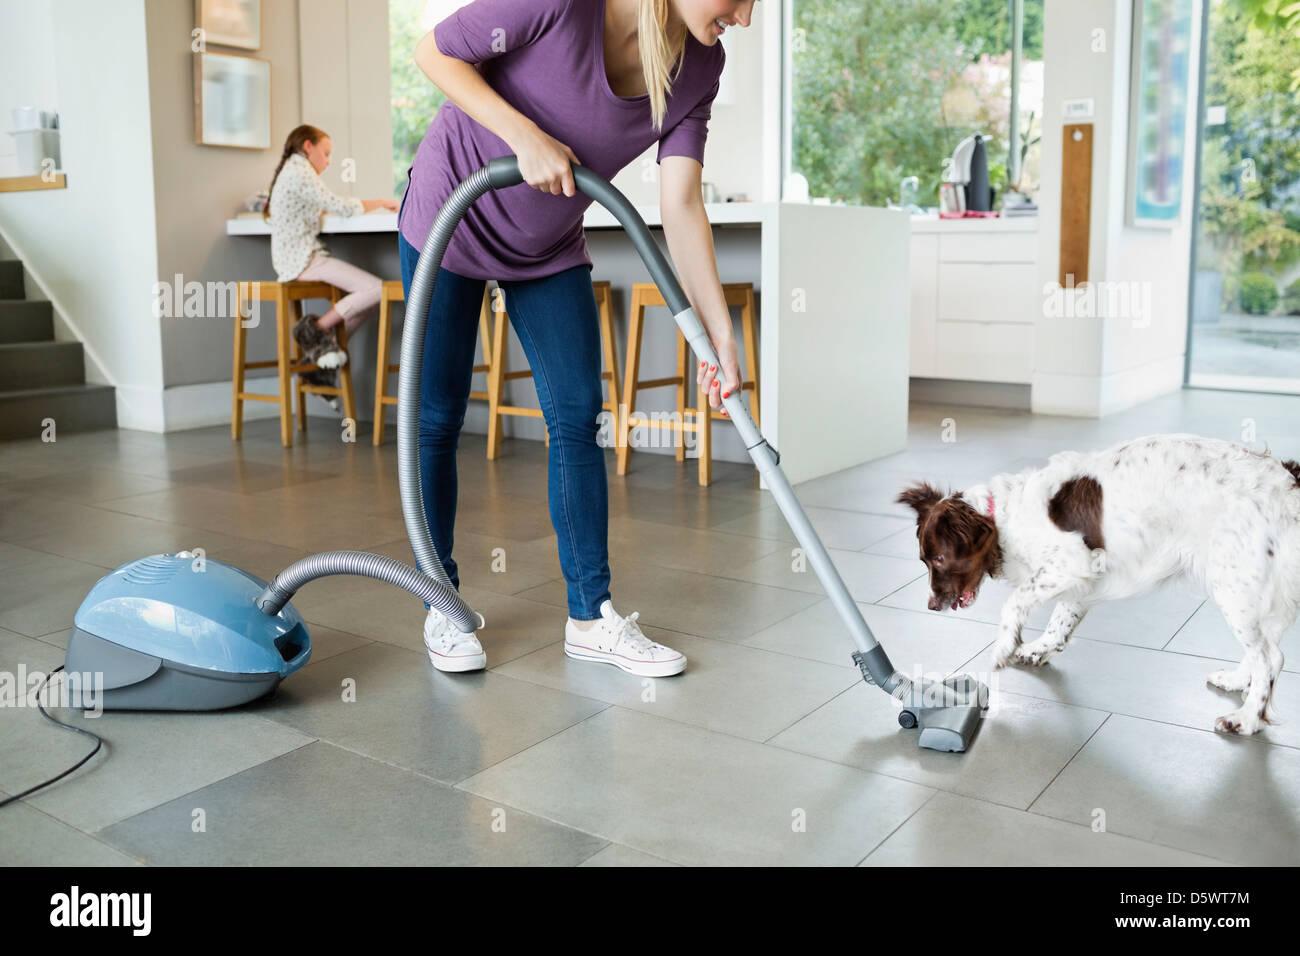 Woman vacuuming around sleeping dog - Stock Image